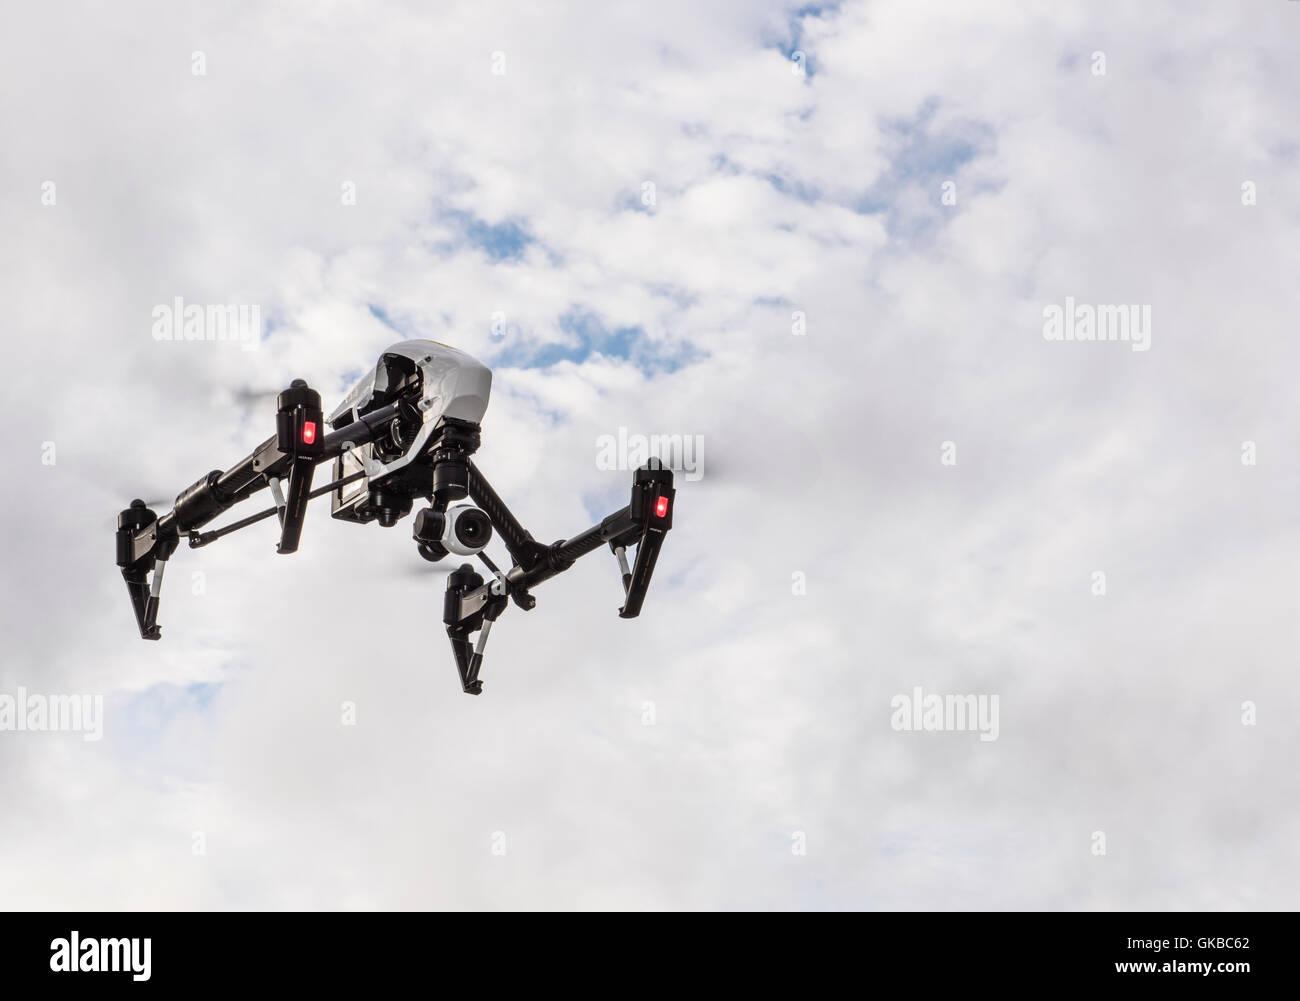 Inspire 1 flying in Virginia Beach, Virginia - Stock Image